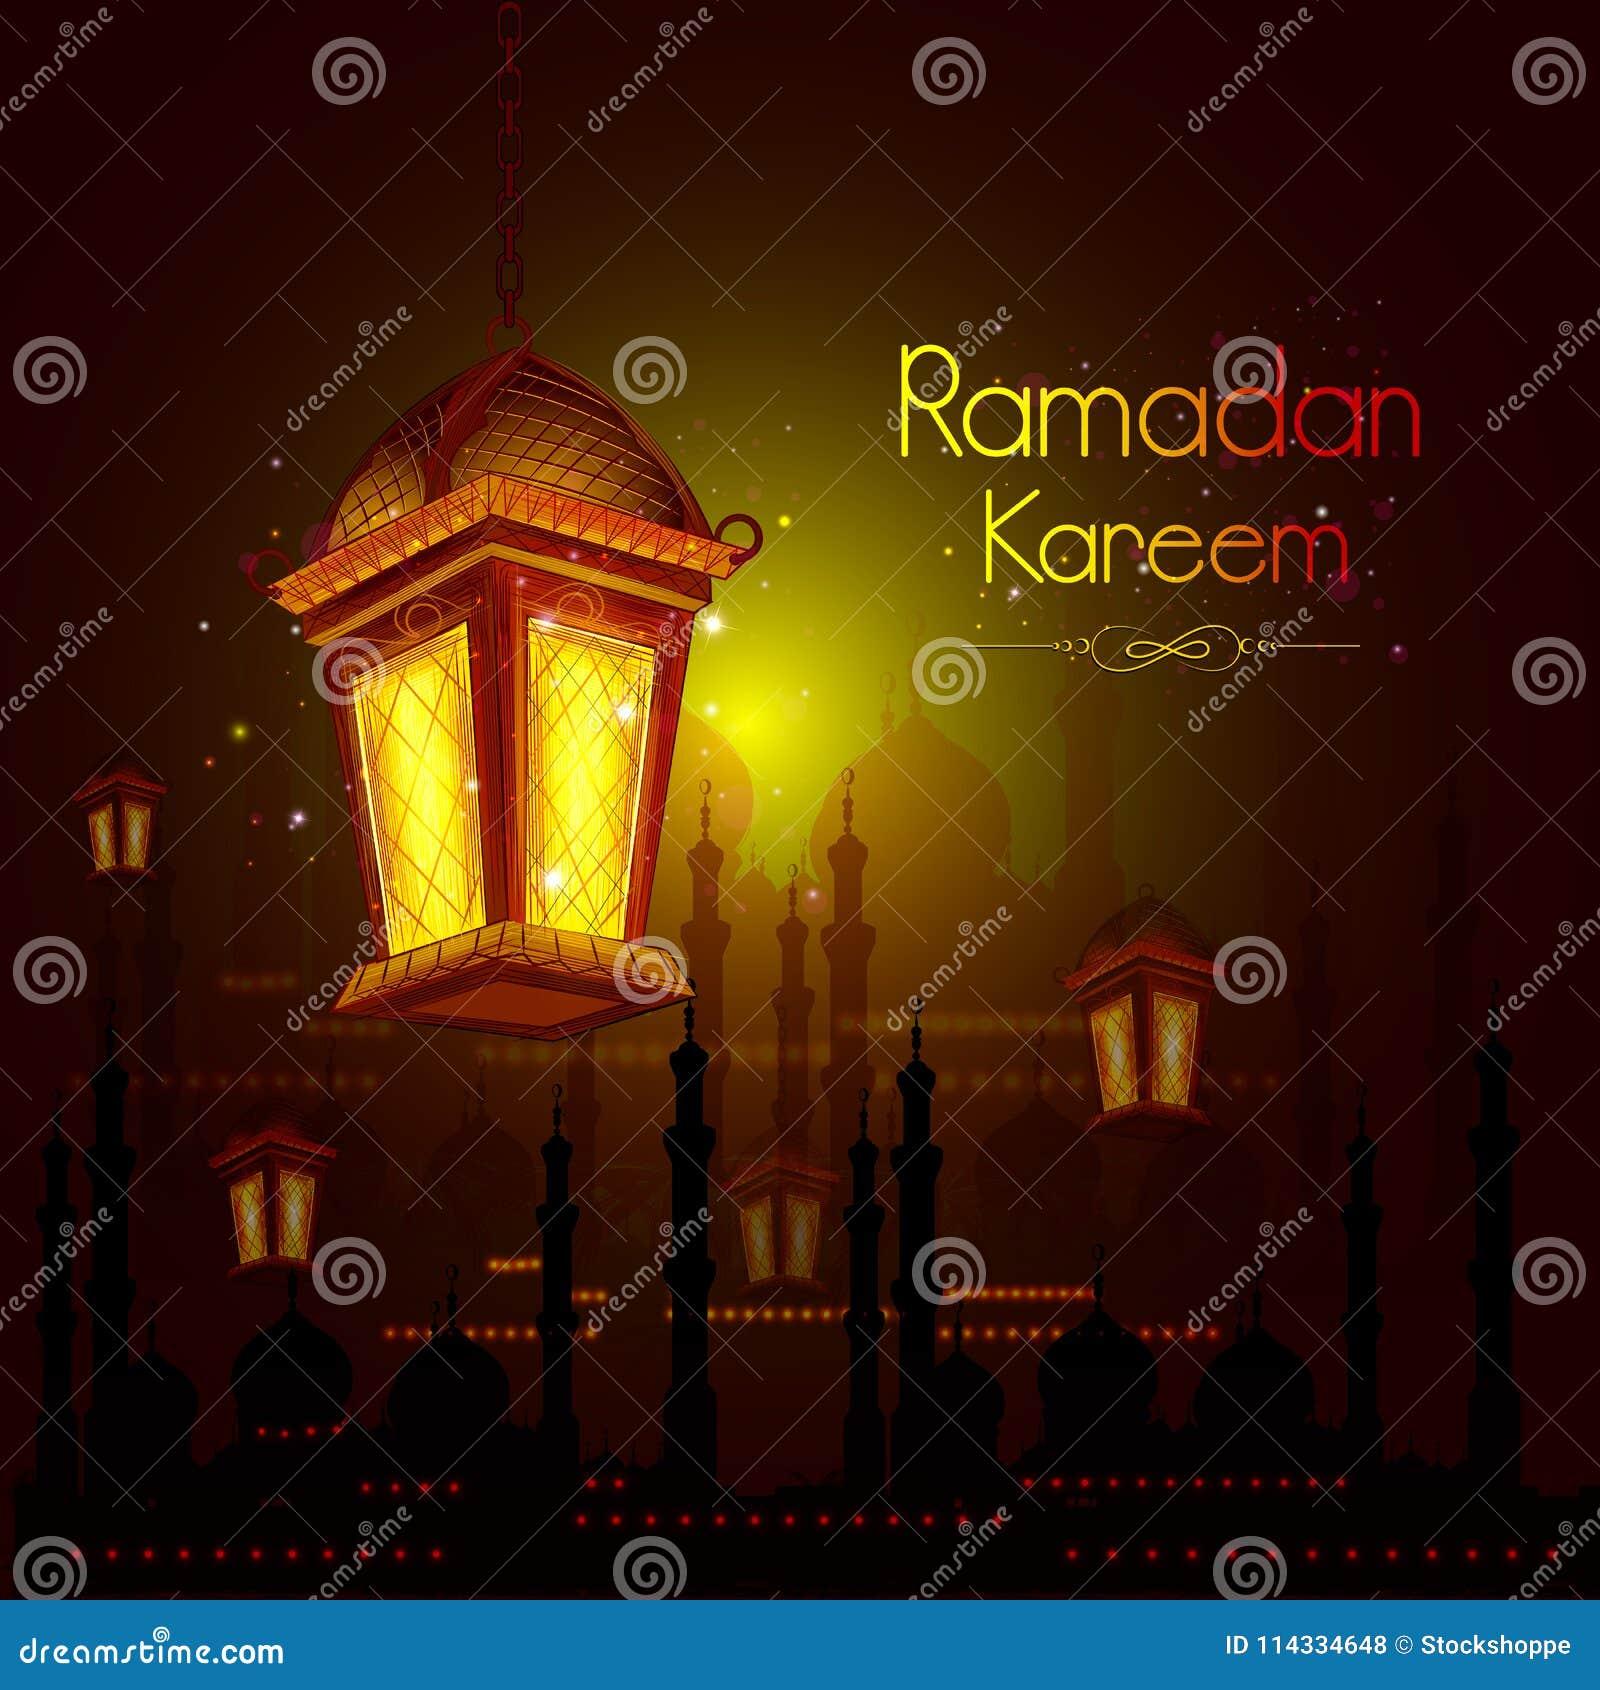 Illuminated lamp for ramadan kareem greetings for ramadan background illuminated lamp for ramadan kareem greetings for ramadan background with islamic mosque m4hsunfo